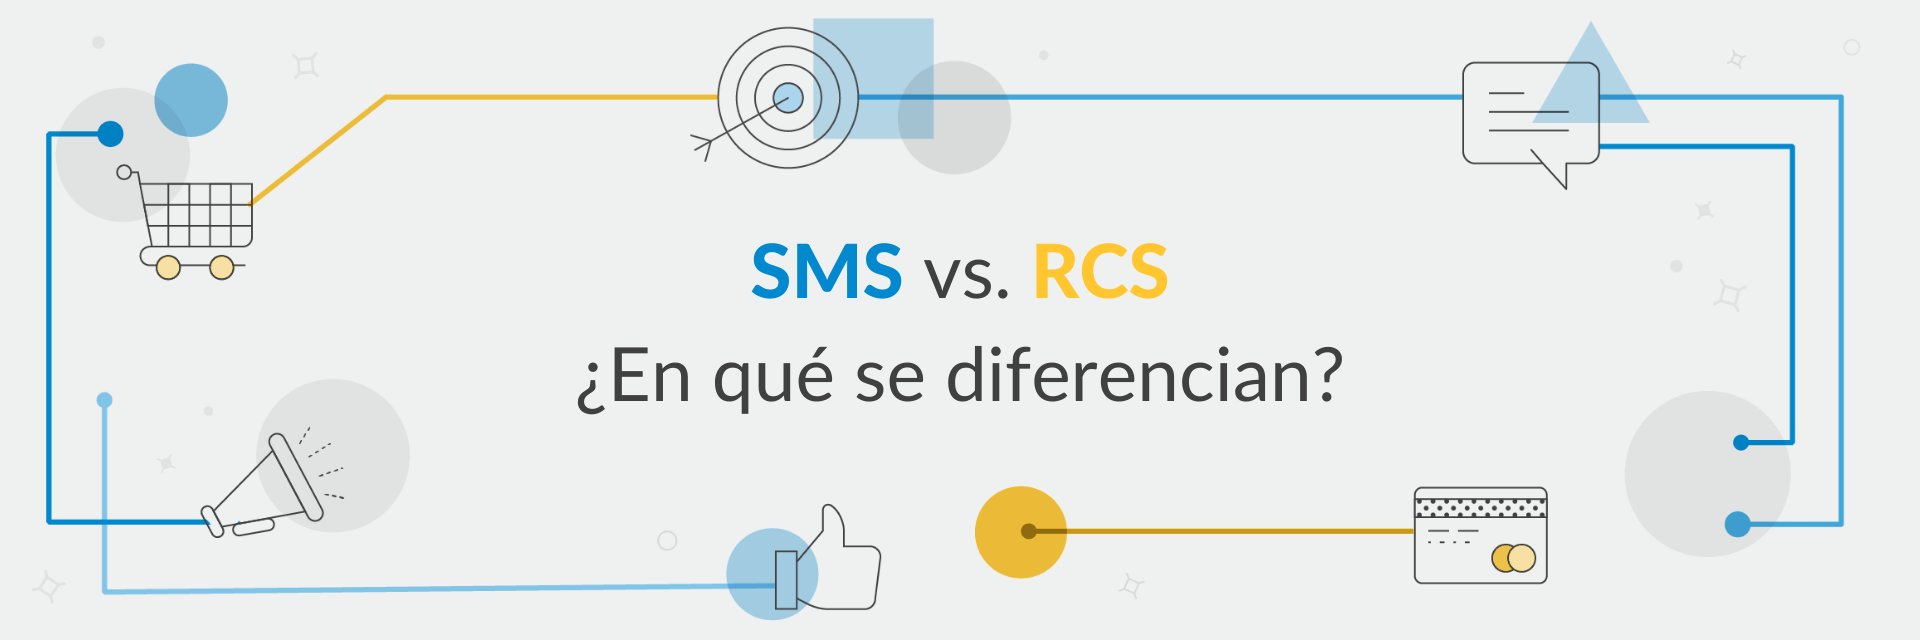 SMS vs RCS header image